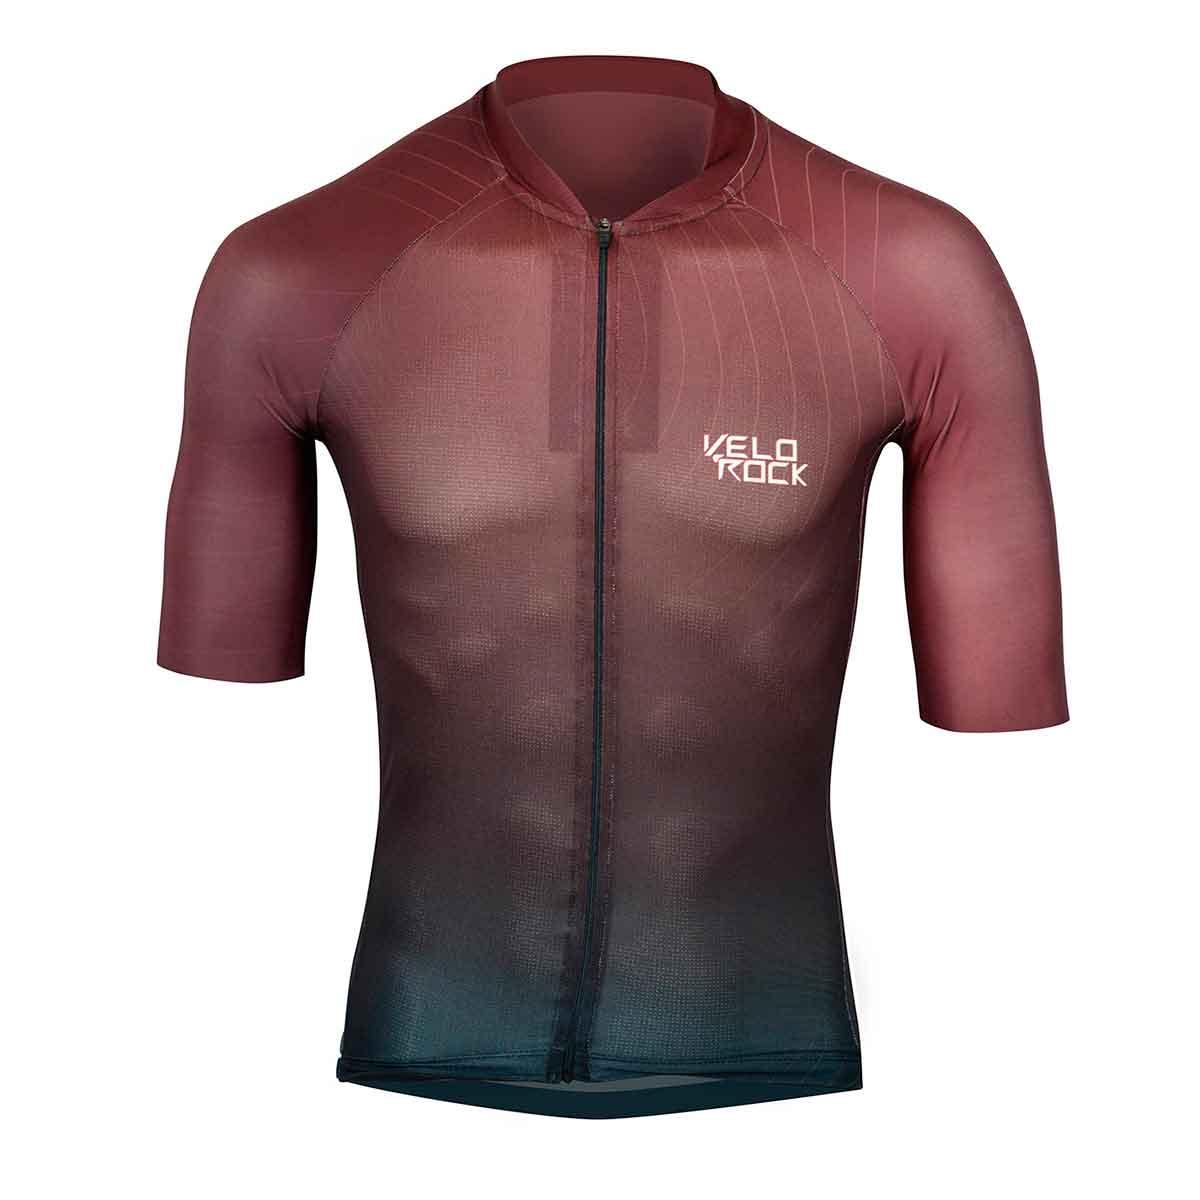 Camisa Velorock Coleção Carbon Ultra XC Masculina